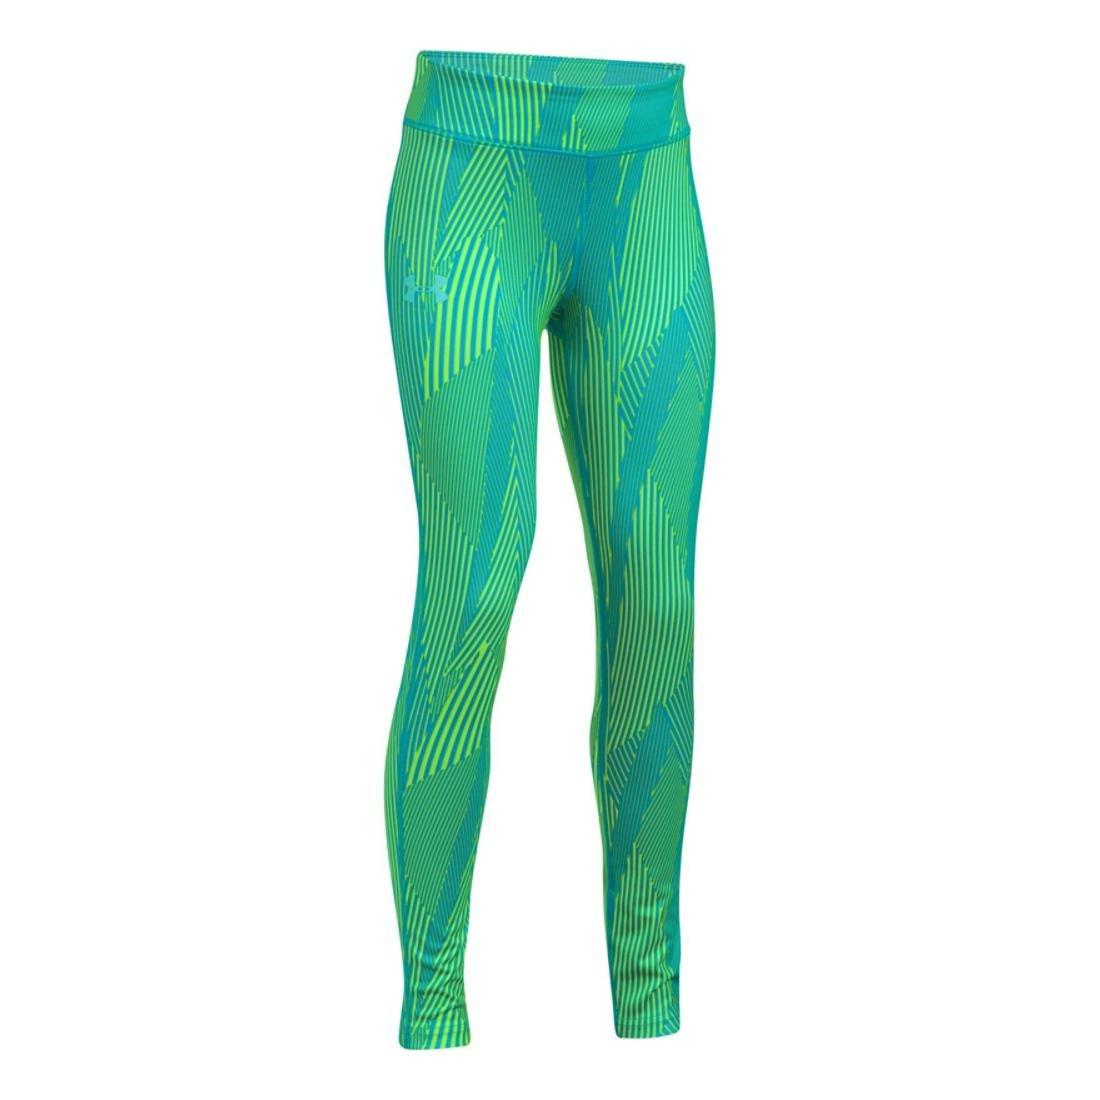 9b1fb64e3b846c Amazon.com : Under Armour Girls HeatGear Printed Legging : Clothing